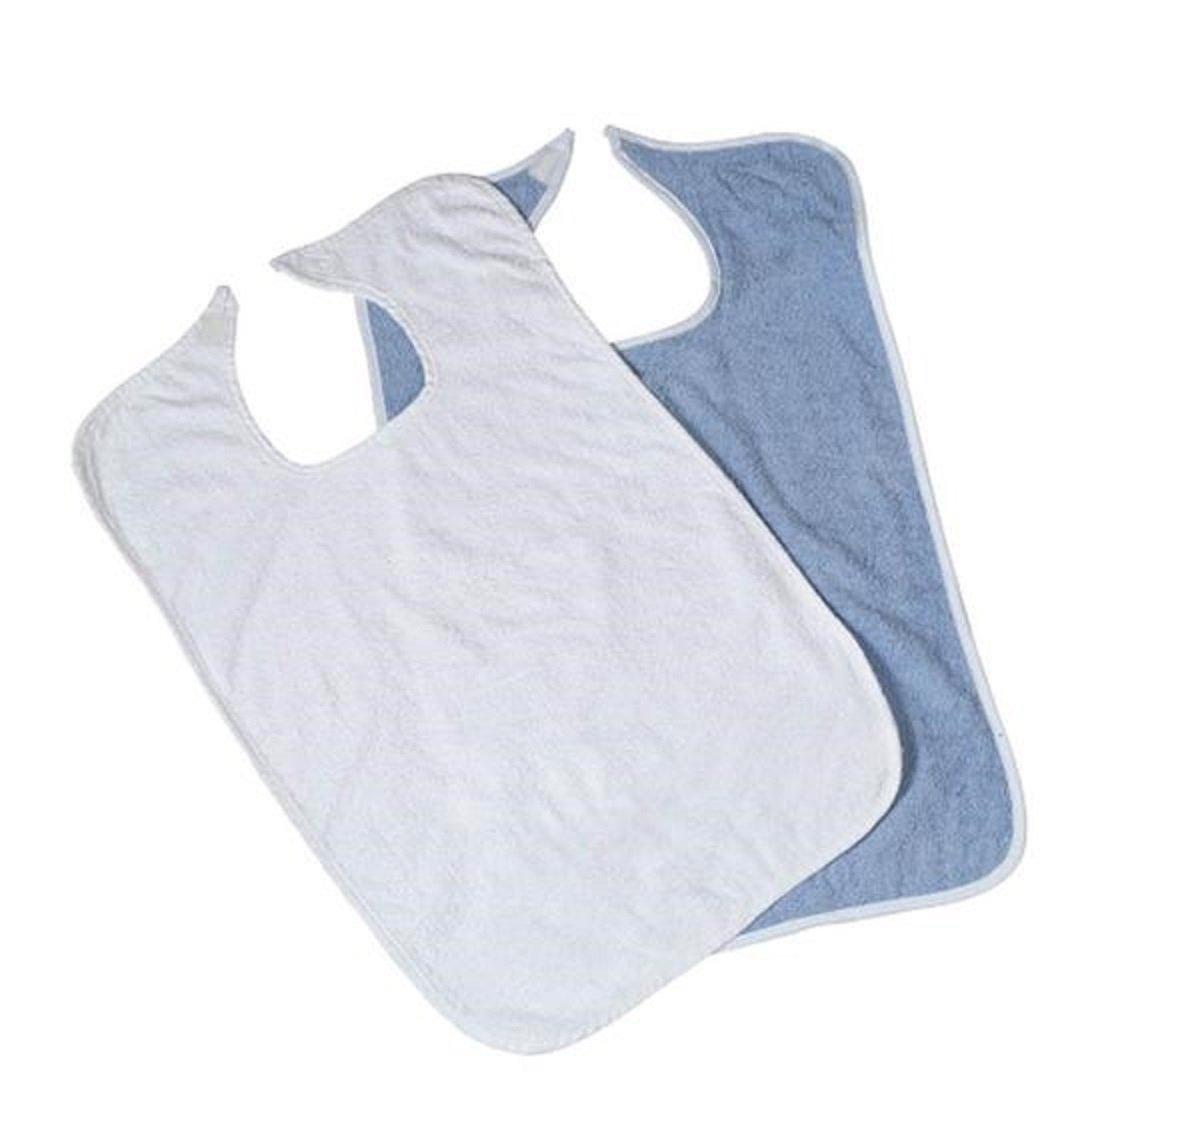 1 DOZEN VELCRO TERRY CLOTH CLOTHING PROTECTORS 18x30 (Blue)